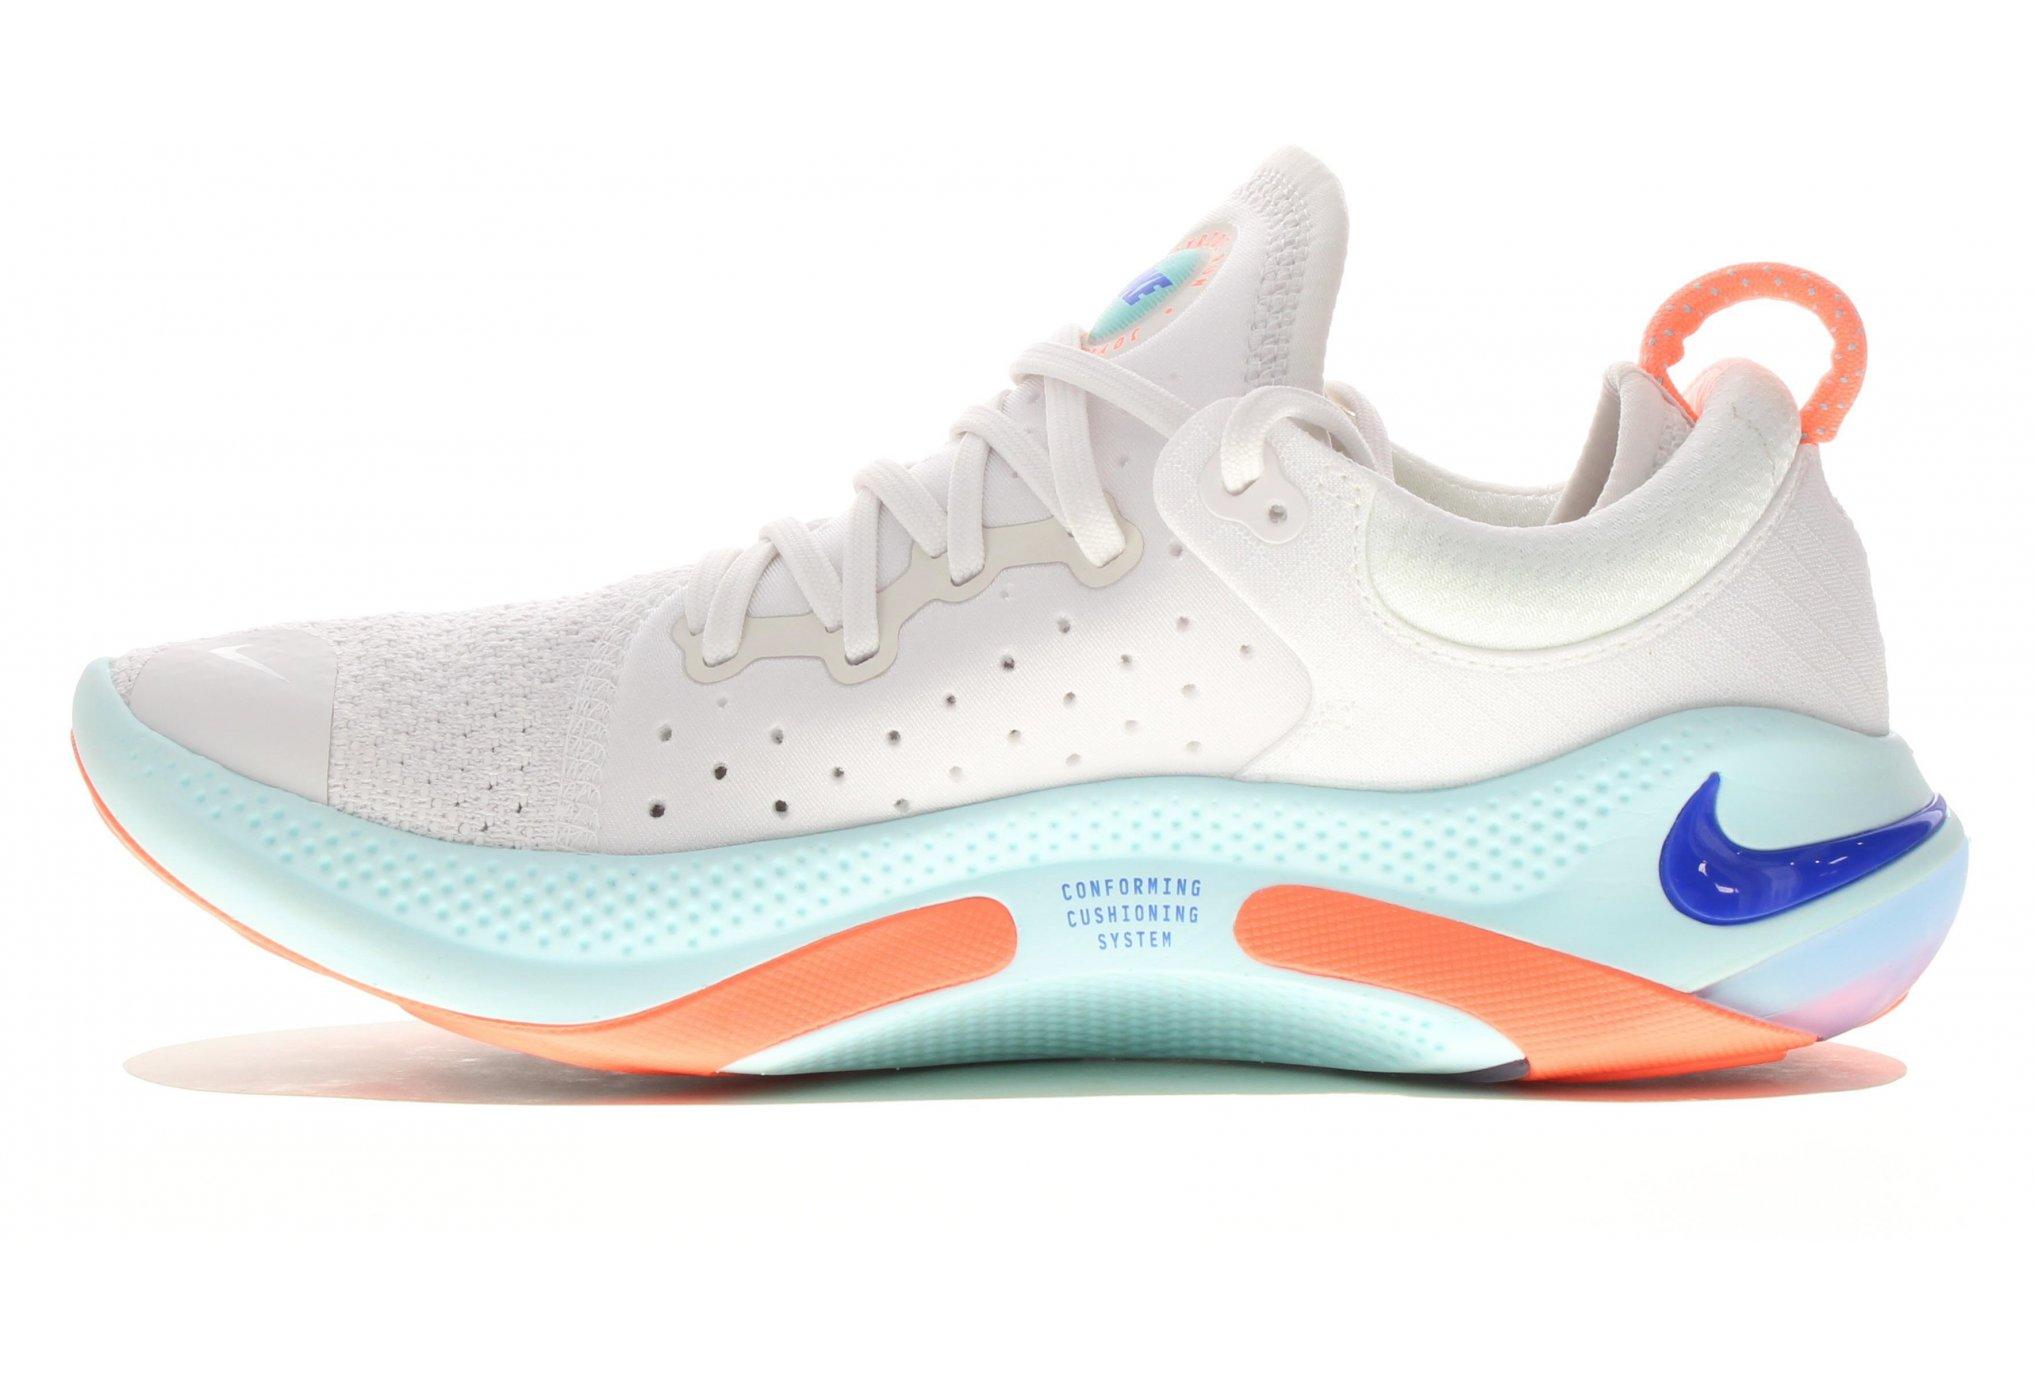 chaussures de sport c3e1e a55fa Nike Joyride, la dernière innovation de la marque ! – U Run